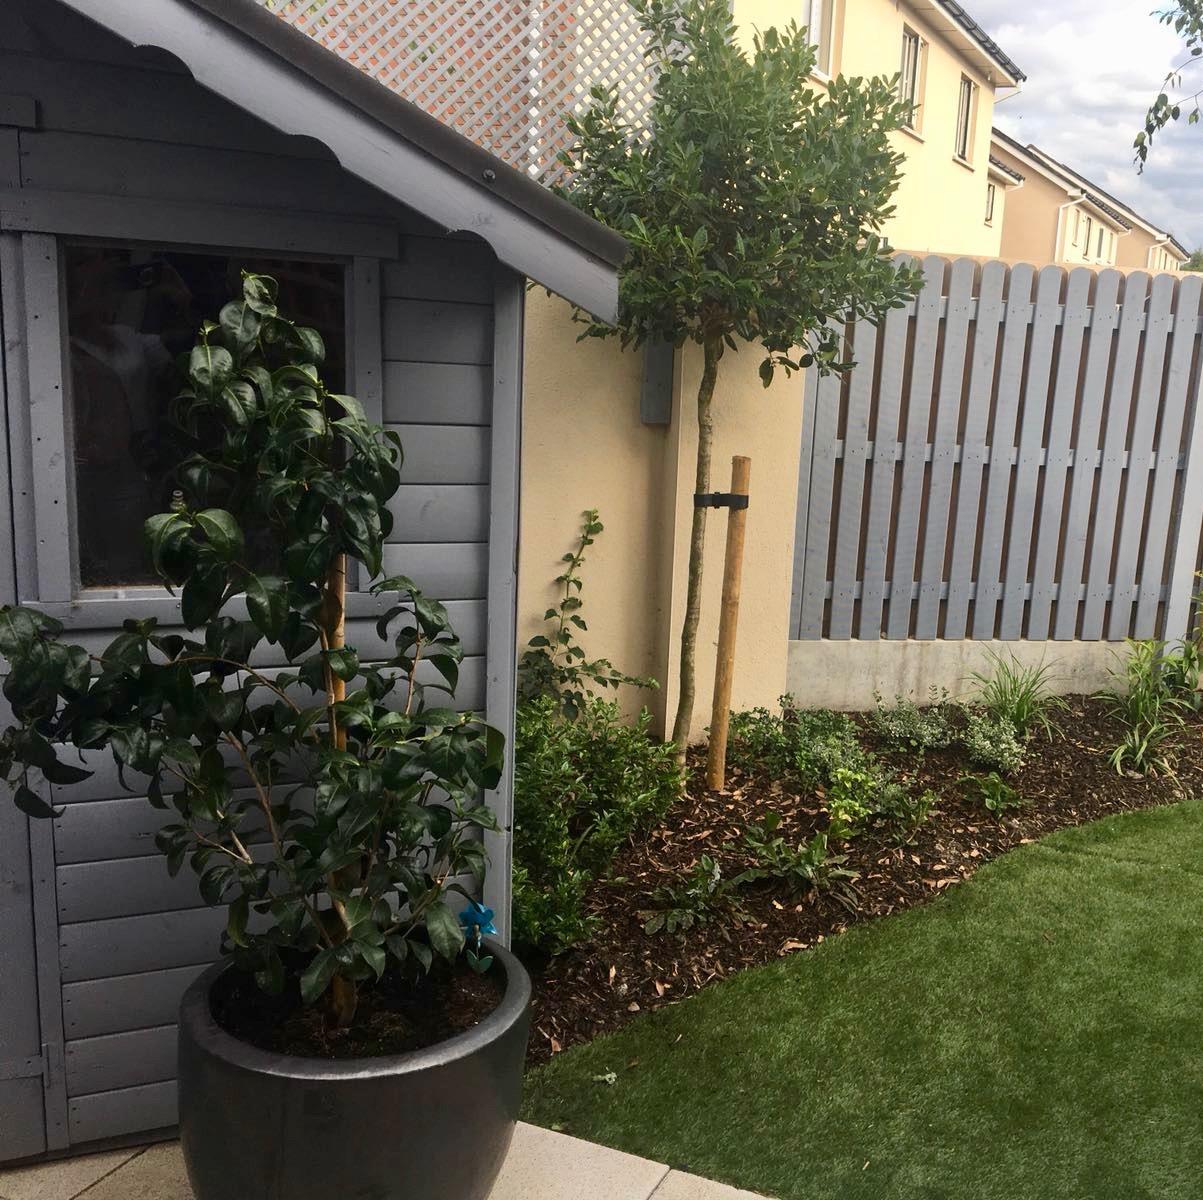 alex-alexandra-hollingsworth-garden-design-fairhaven-3.jpg